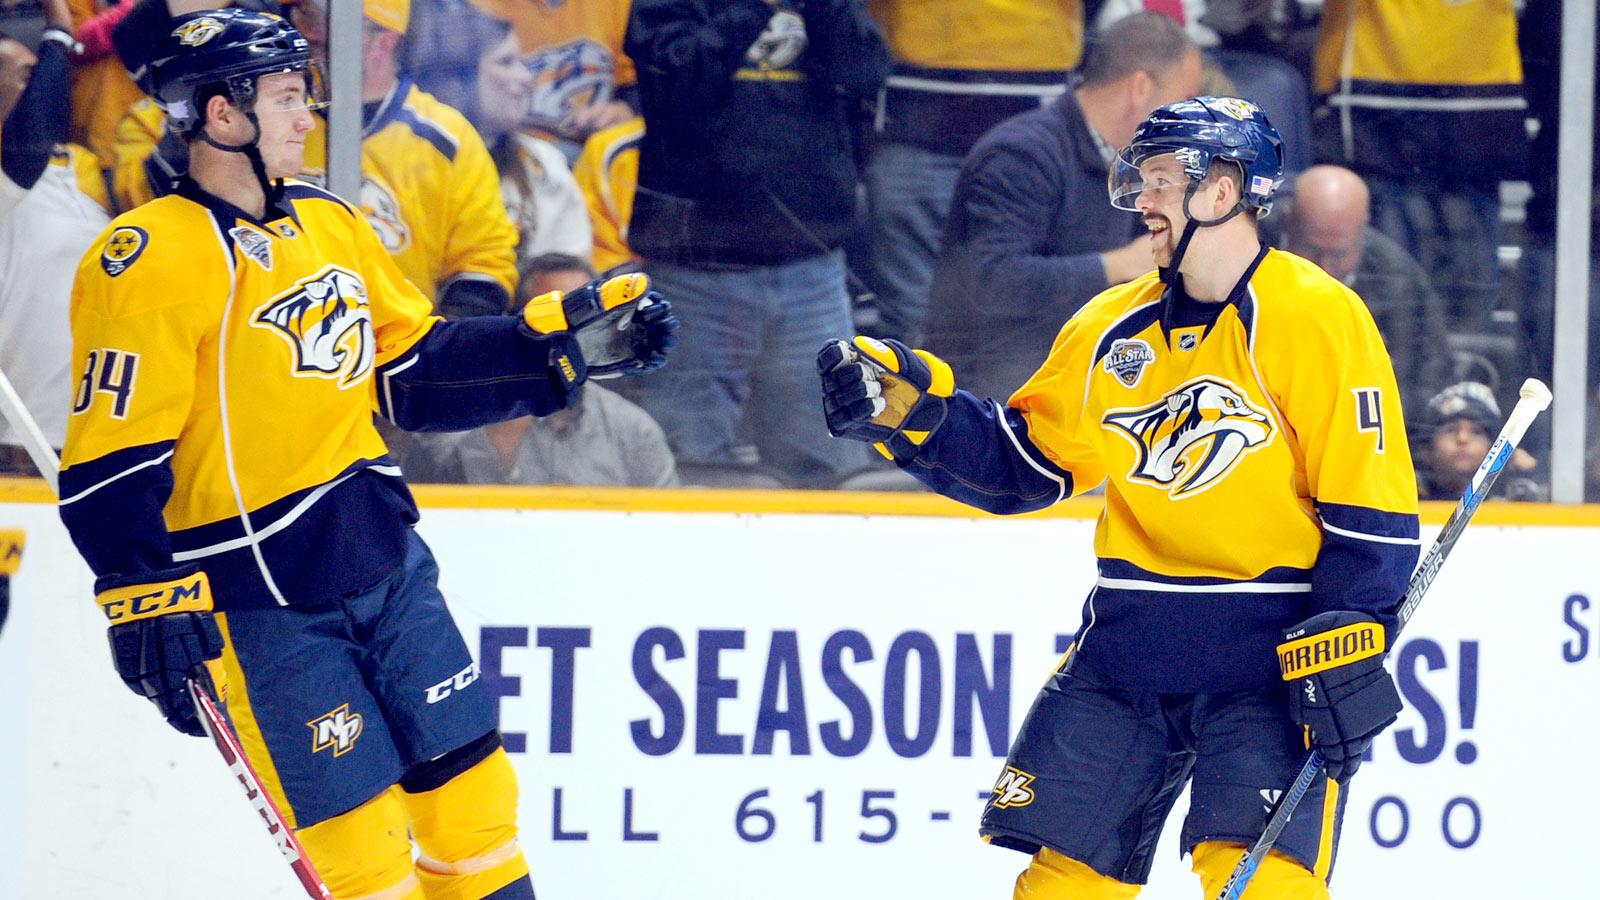 Predators call-up leads win over Senators